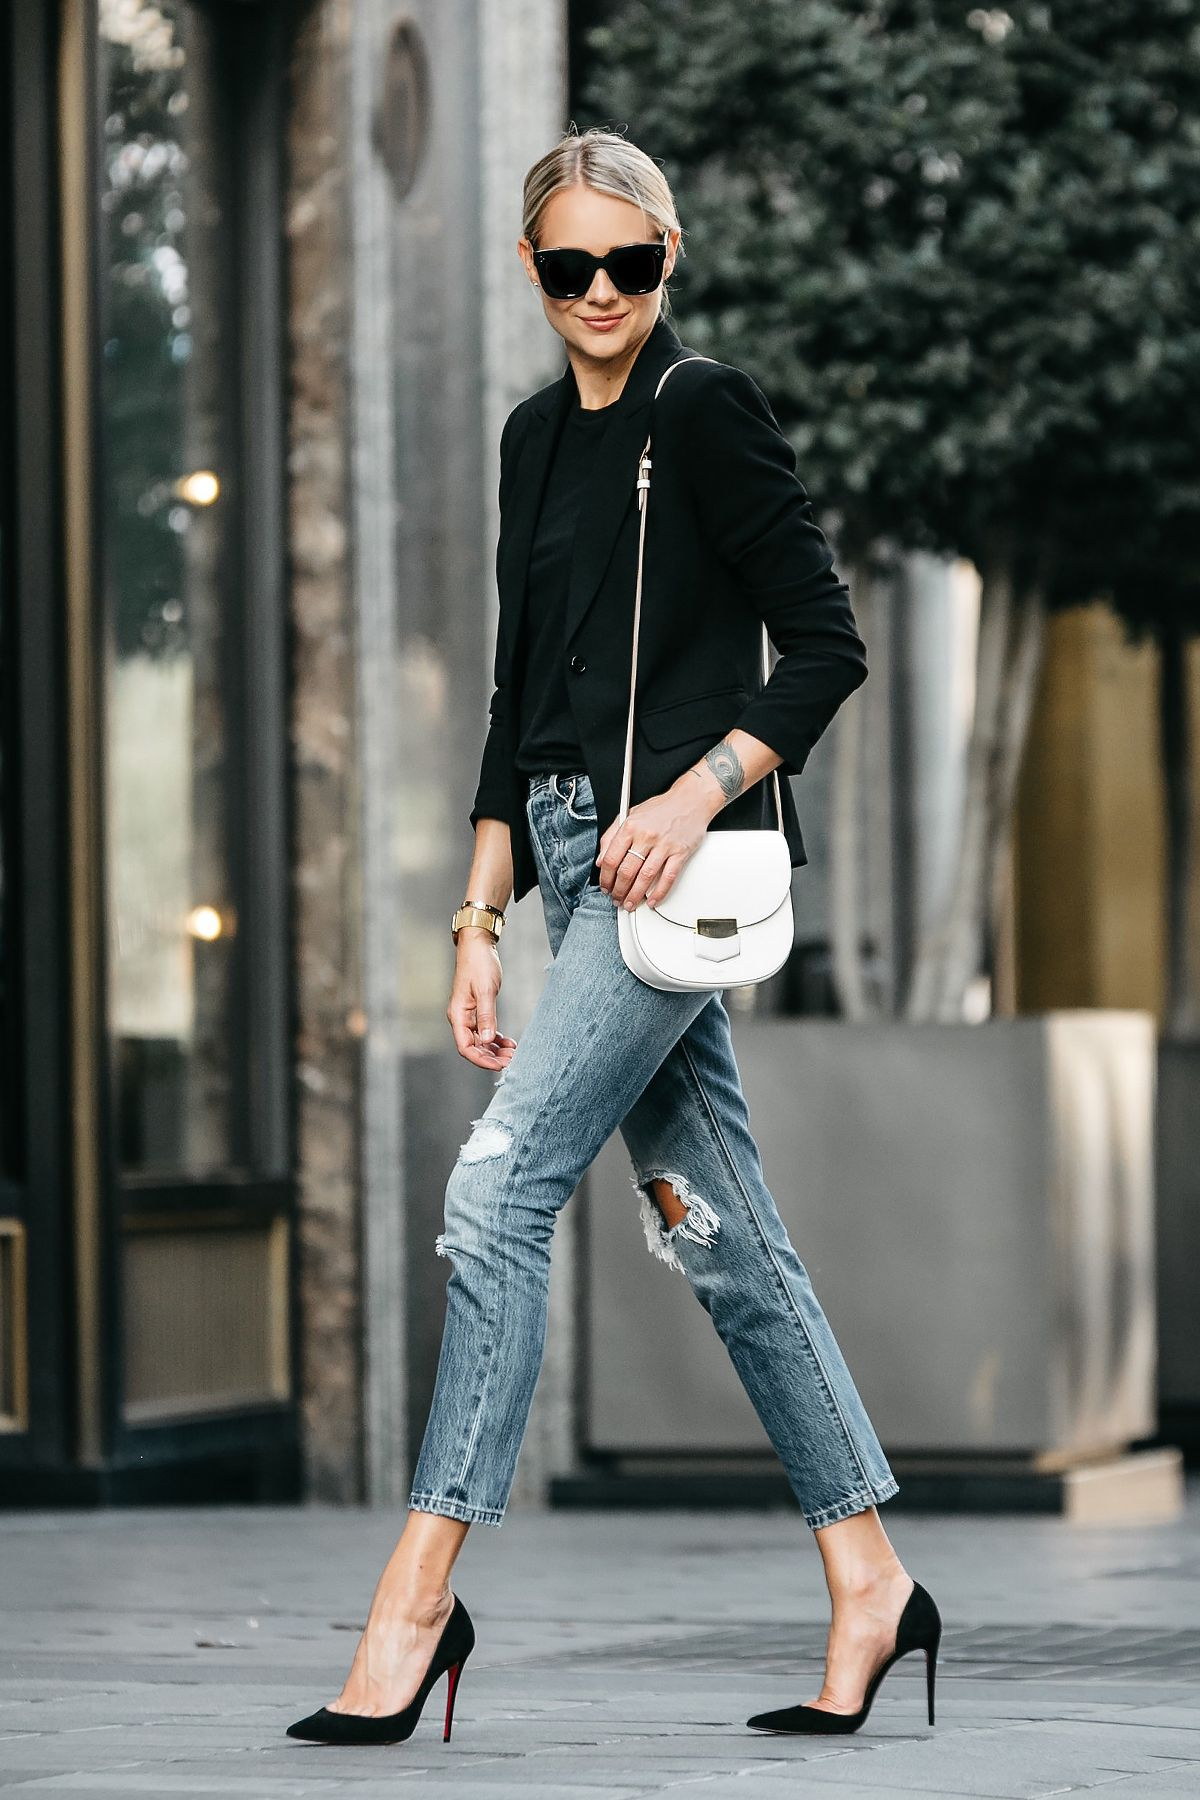 946f89150ce Blonde Woman Wearing Black Blazer Black Tshirt Denim Ripped Jeans Outfit  Christian Louboutin Black Pumps Celine Trotteur White Handbag Fashion  Jackson ...